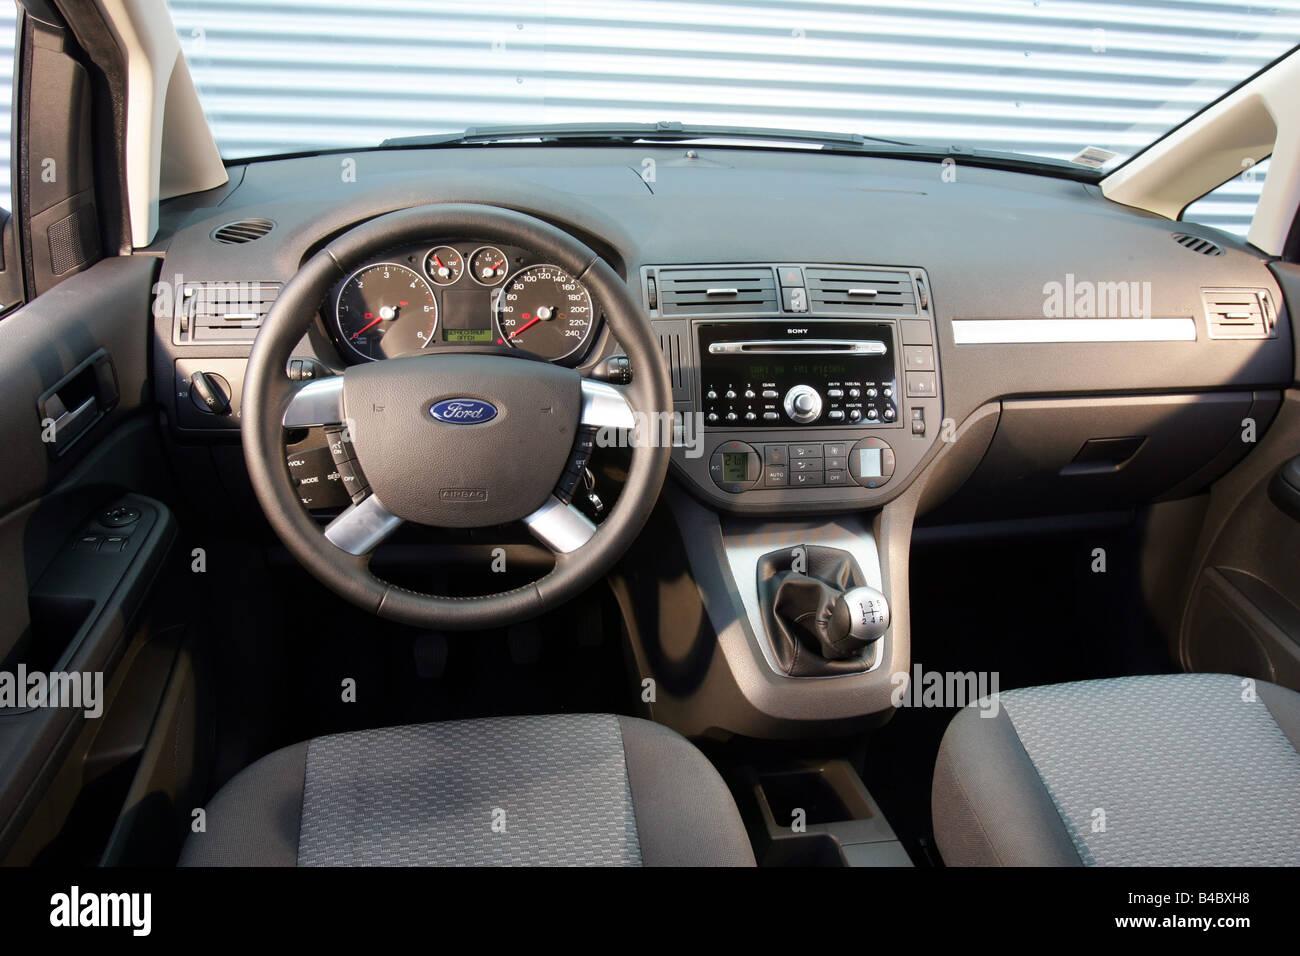 Auto, Ford Focus C-Max, Limousine, untere mittlere Klasse, Bj. 2003 ...